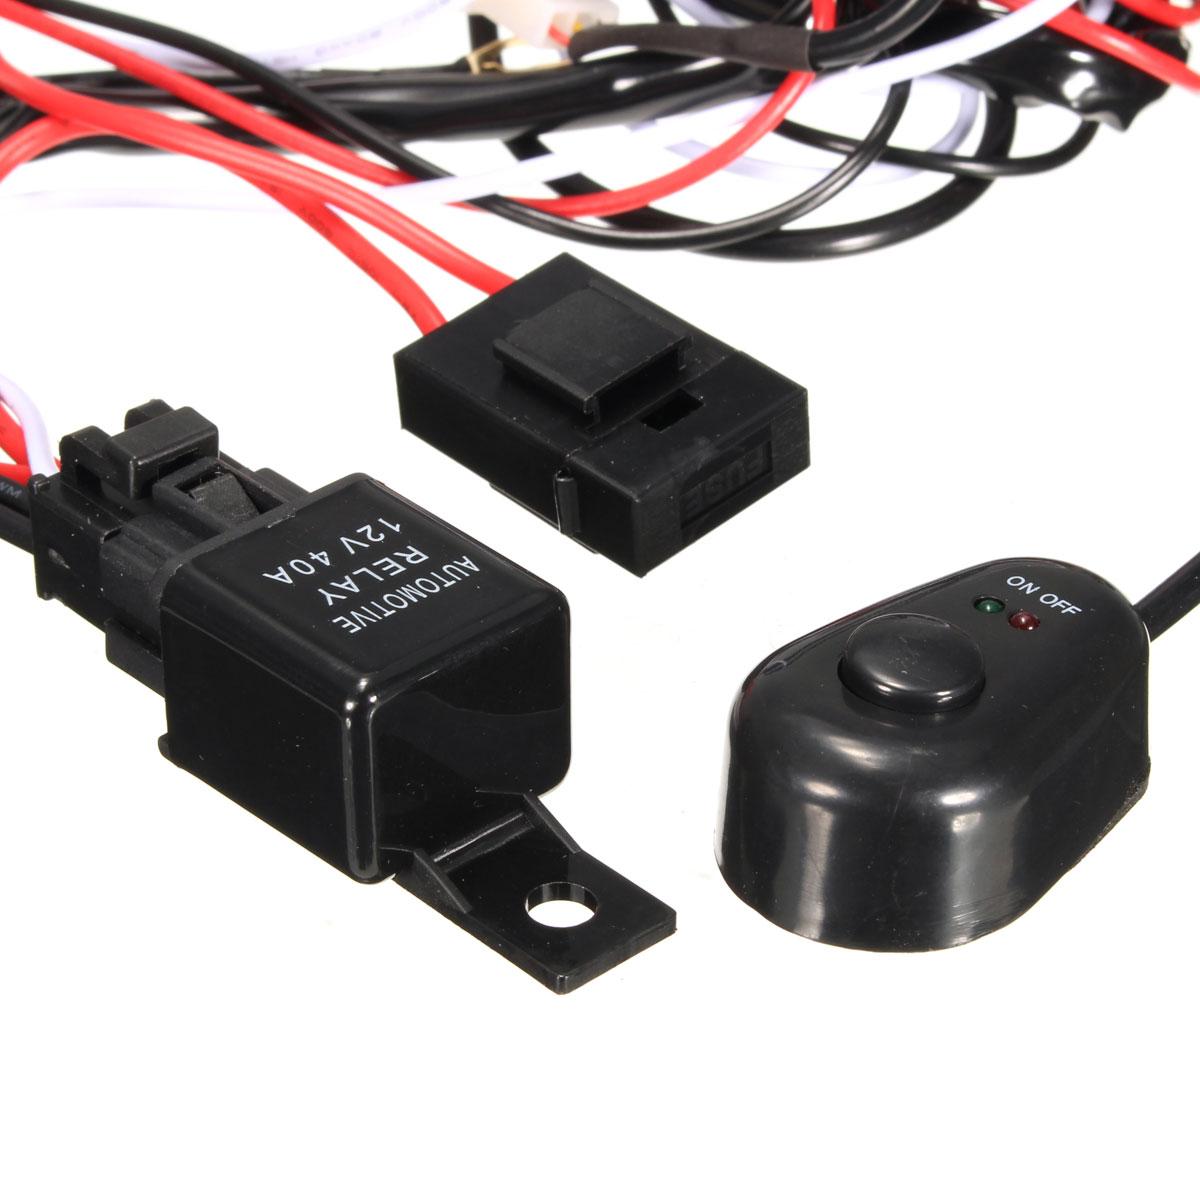 Led Light Bar Wiring Loom Harness 40a Switch Relay Kit Work Light 12v